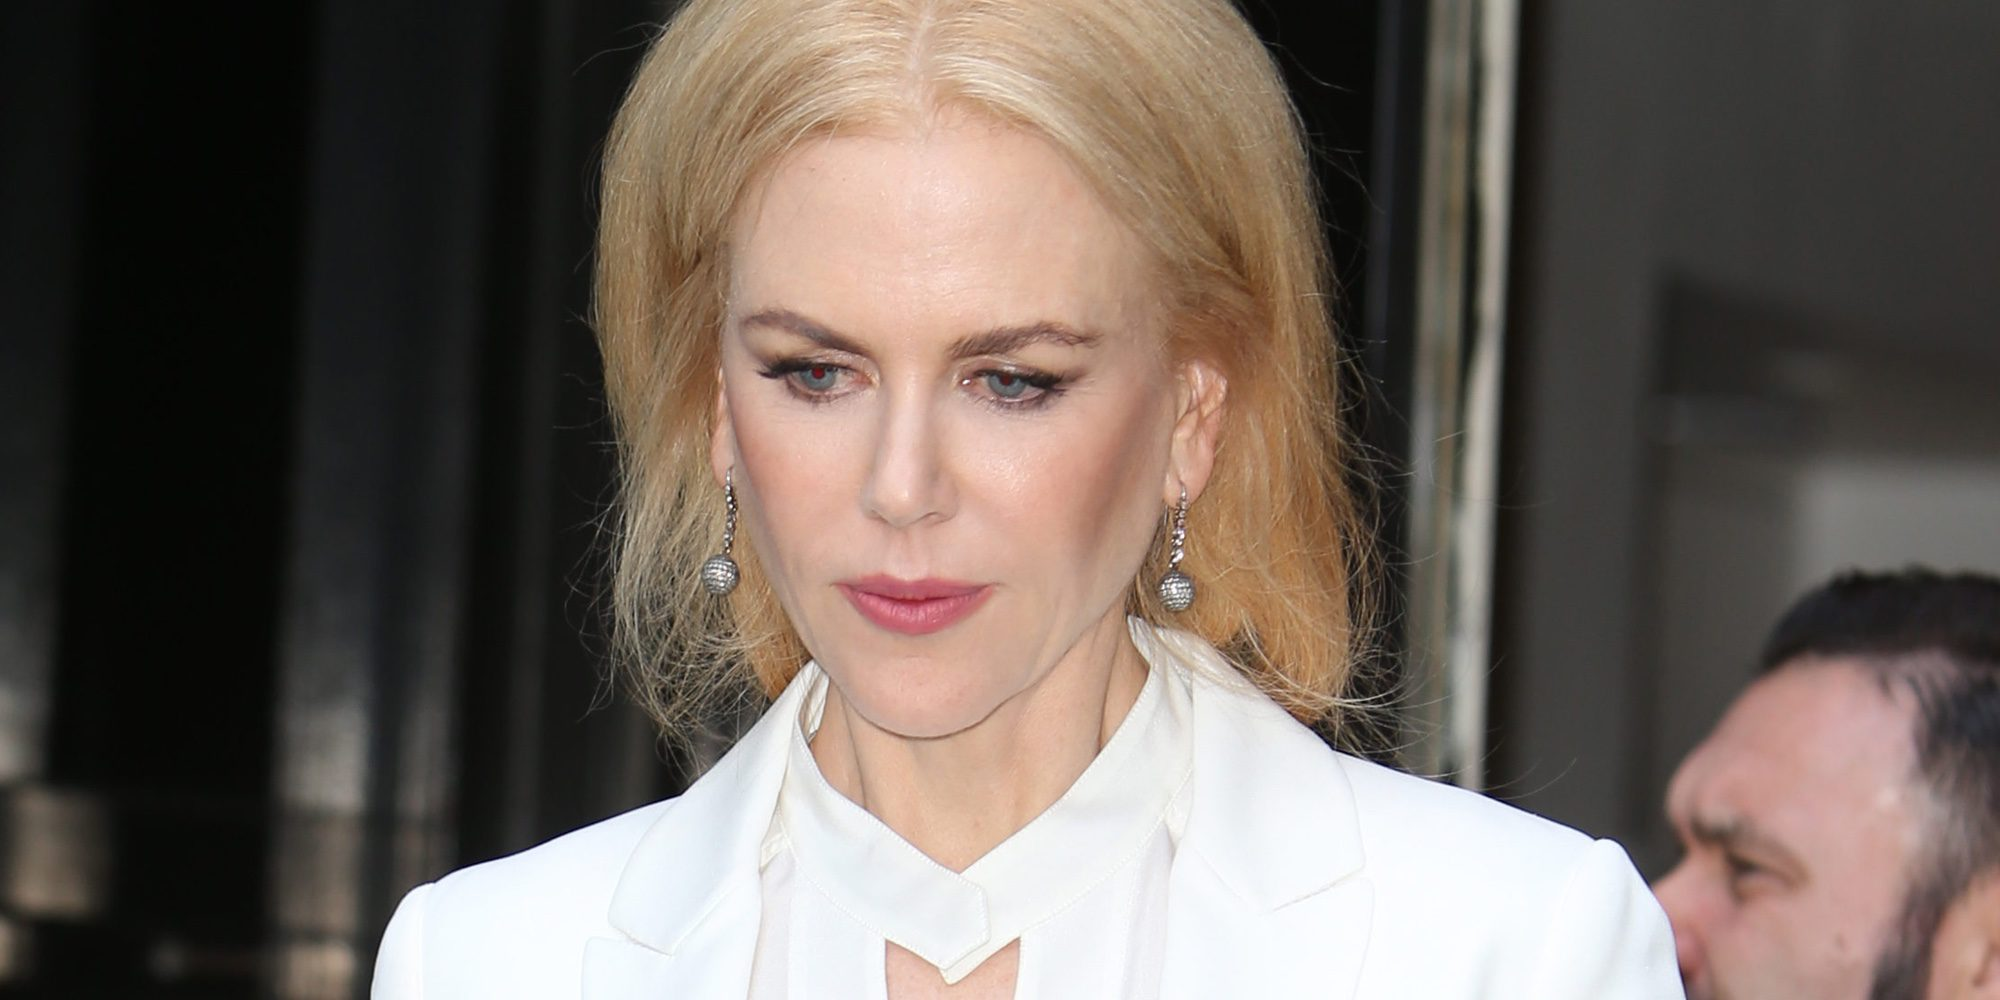 Nicole Kidman revela que se sintió humillada en el rodaje de 'Big Little Lies'